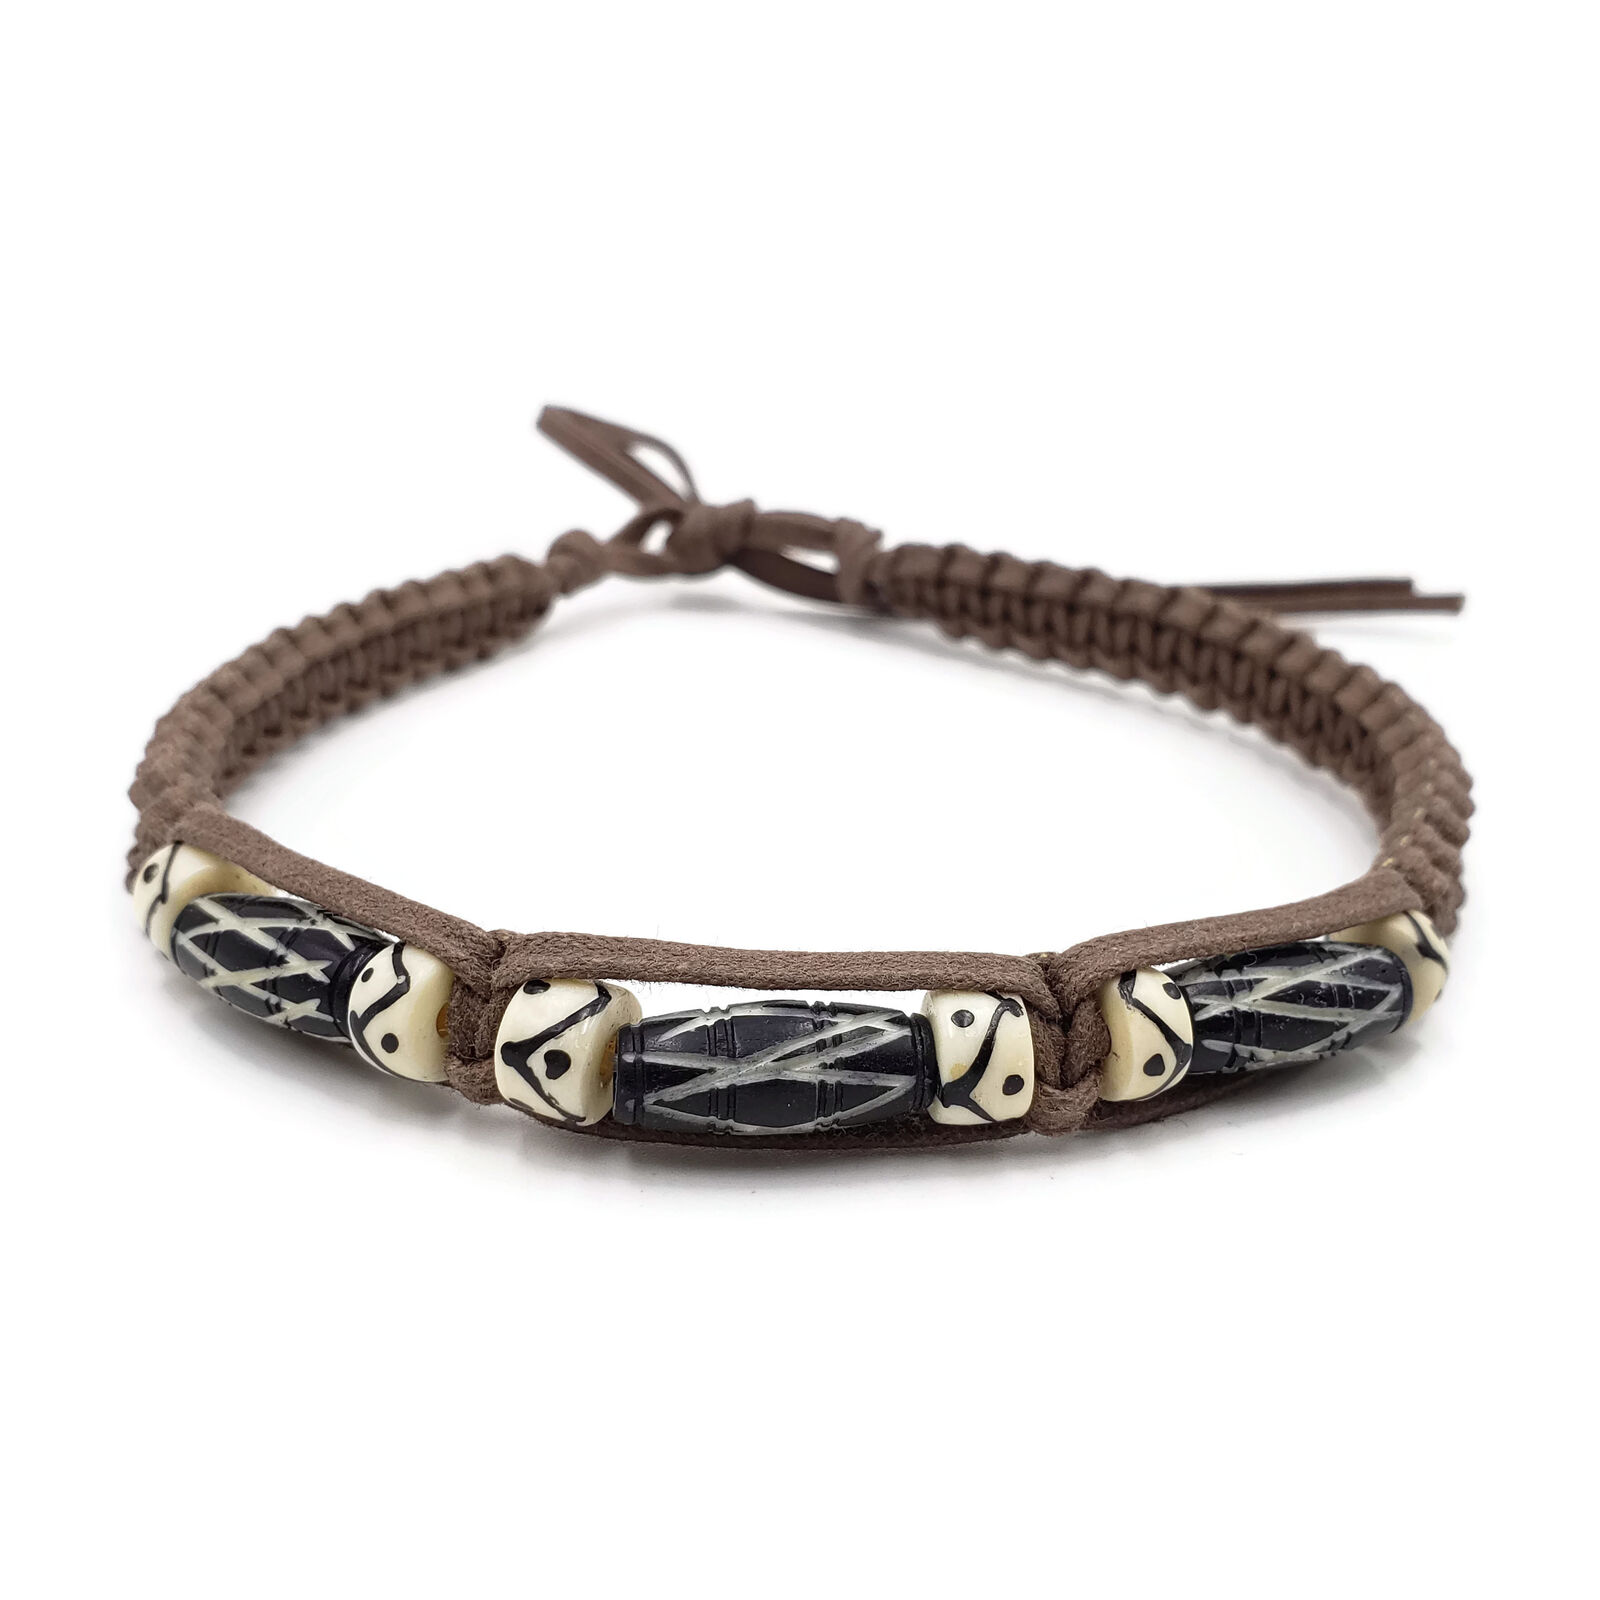 Buffalo Bone Choker Leather Binding Native American Jewelry Beads CK4461-WH